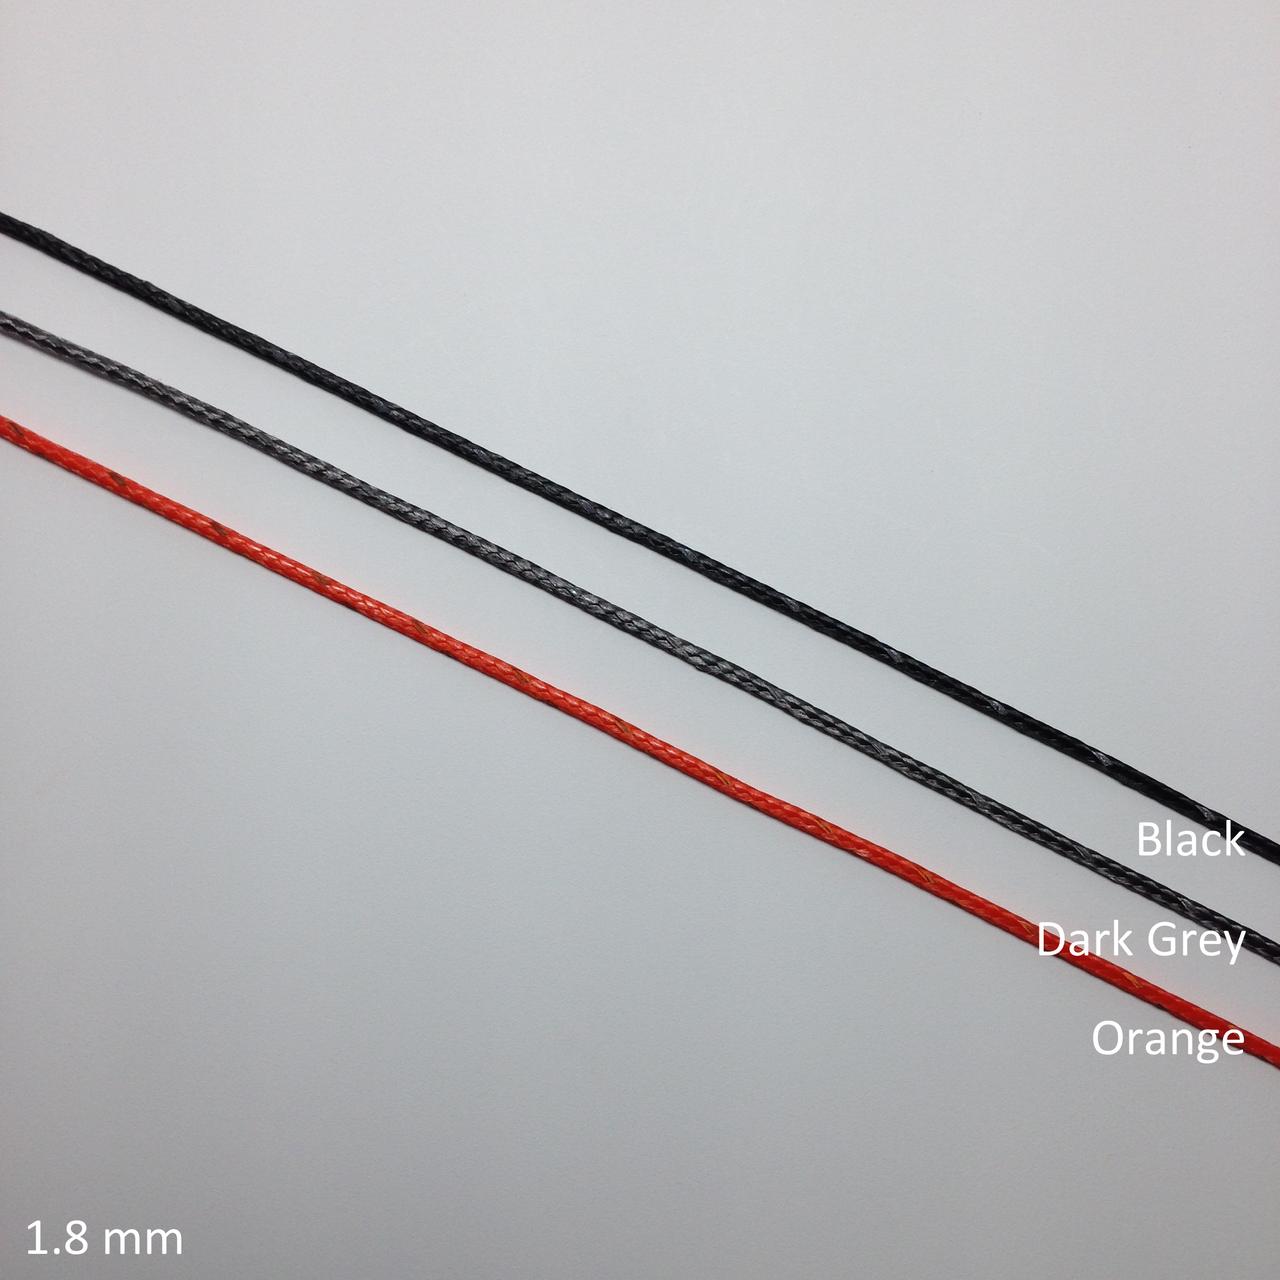 Catzye™ Reflective Hammock Line | Litesmith